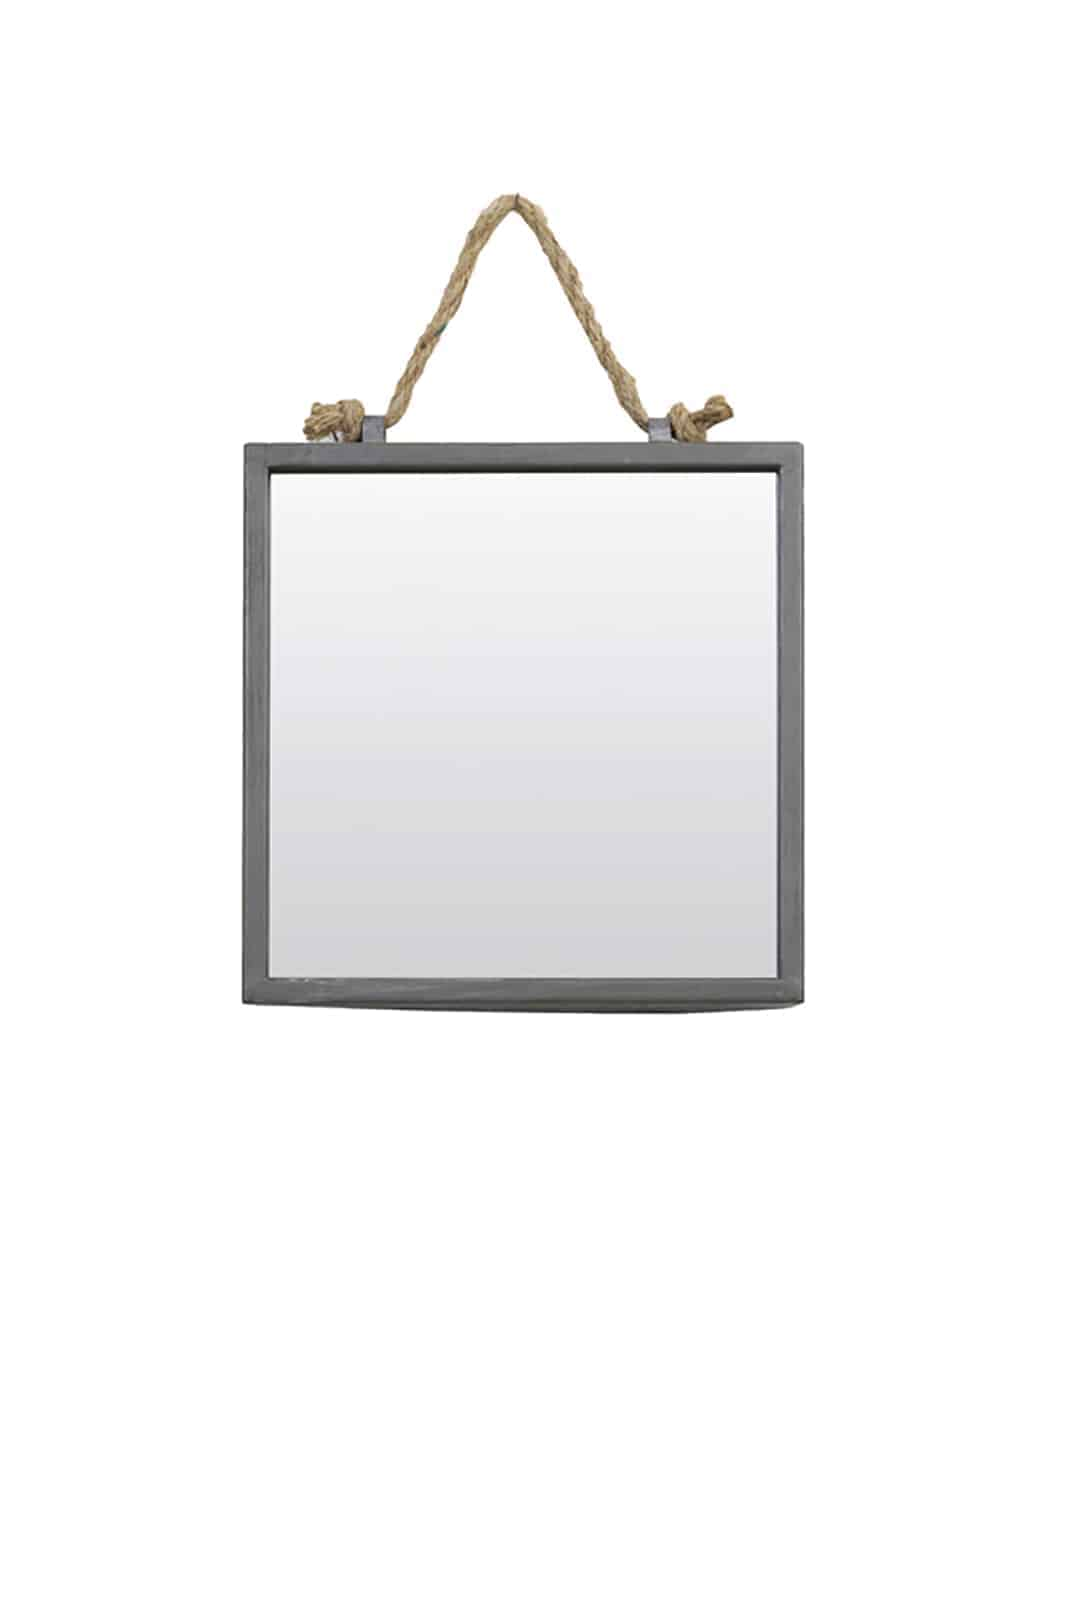 mirror with zinc frame